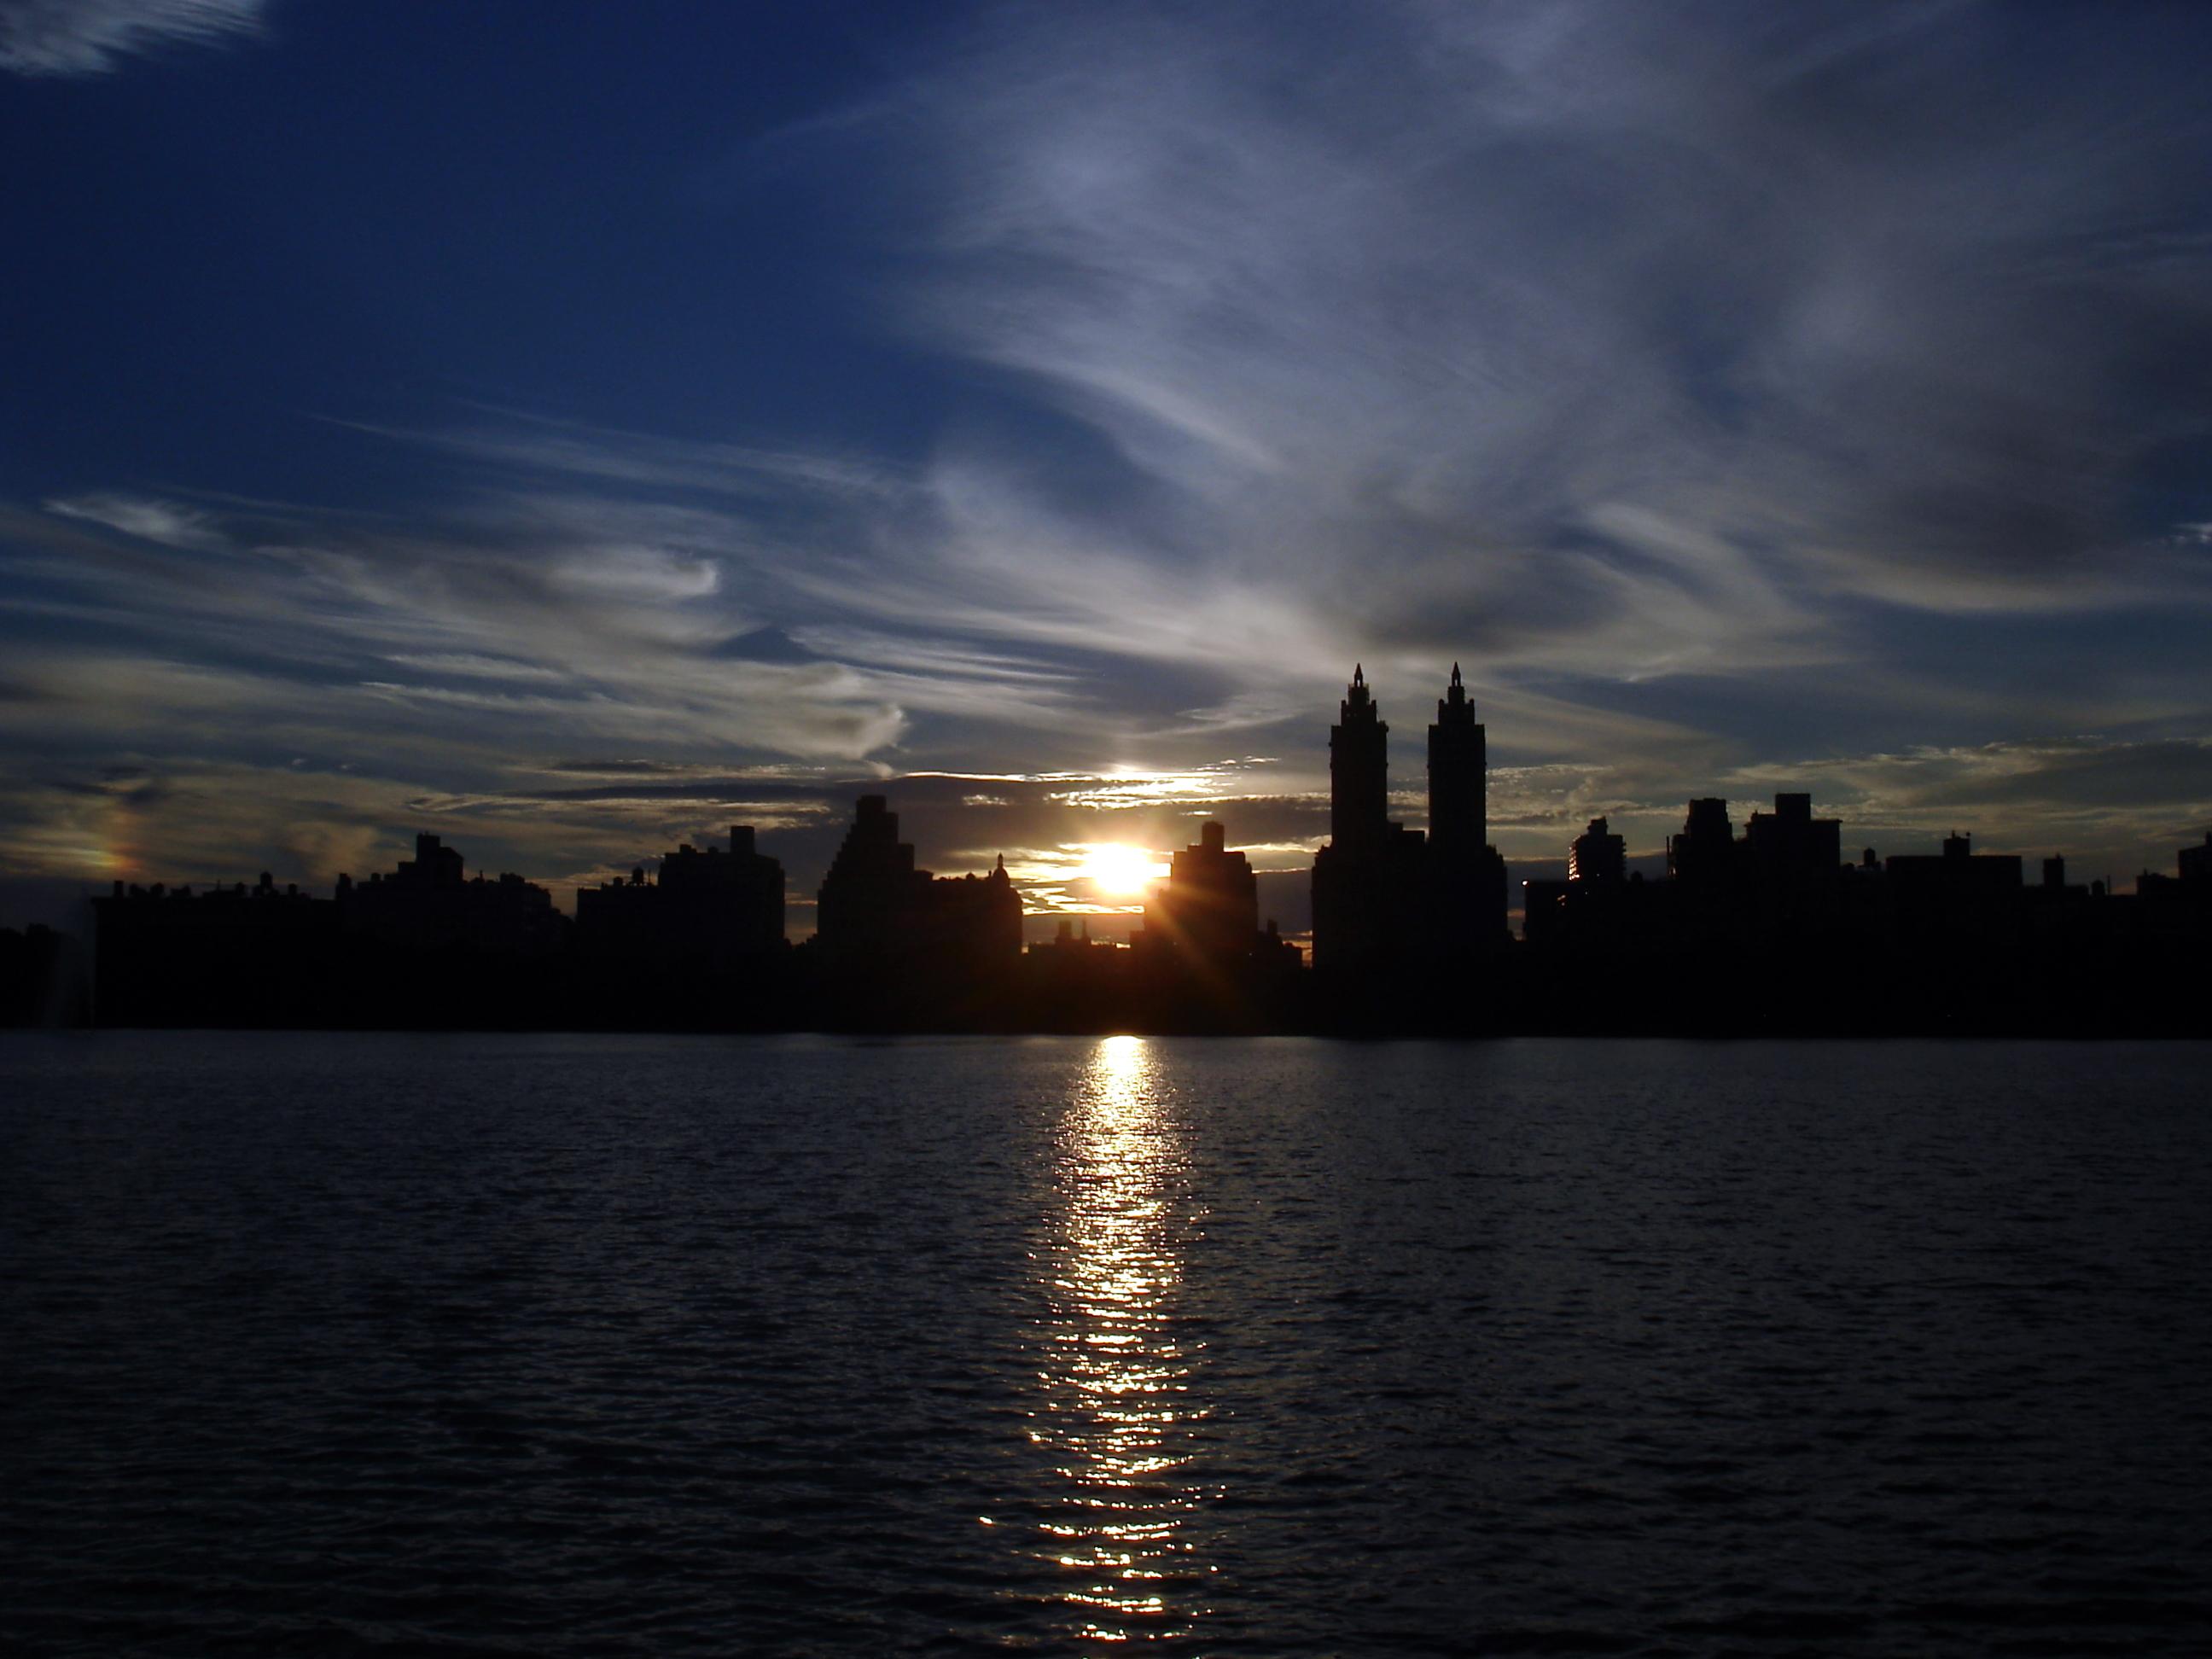 Sunset #13,514